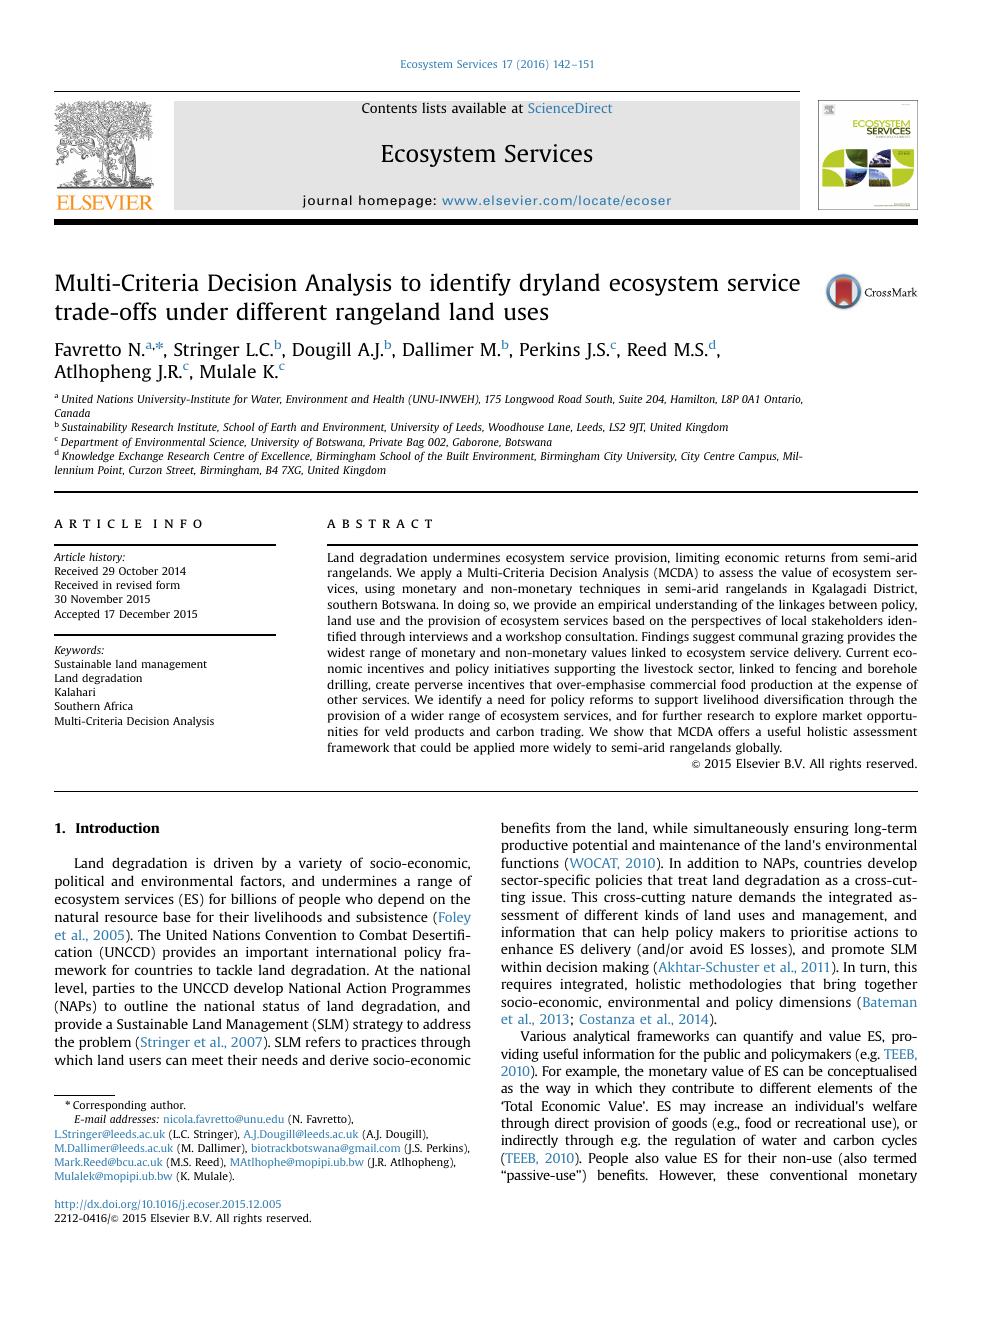 Multi-Criteria Decision Analysis to identify dryland